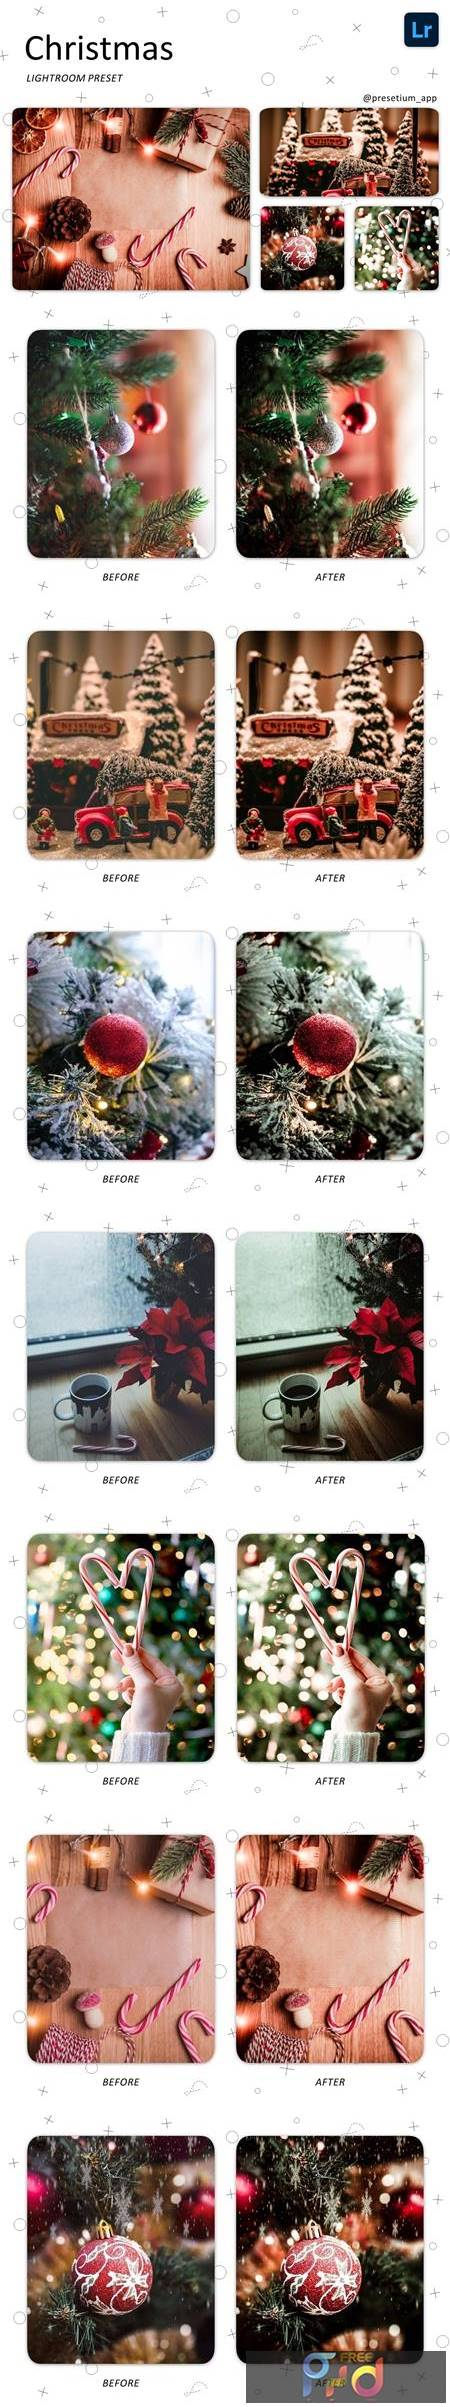 Christmas - Lightroom Presets 5223757 1